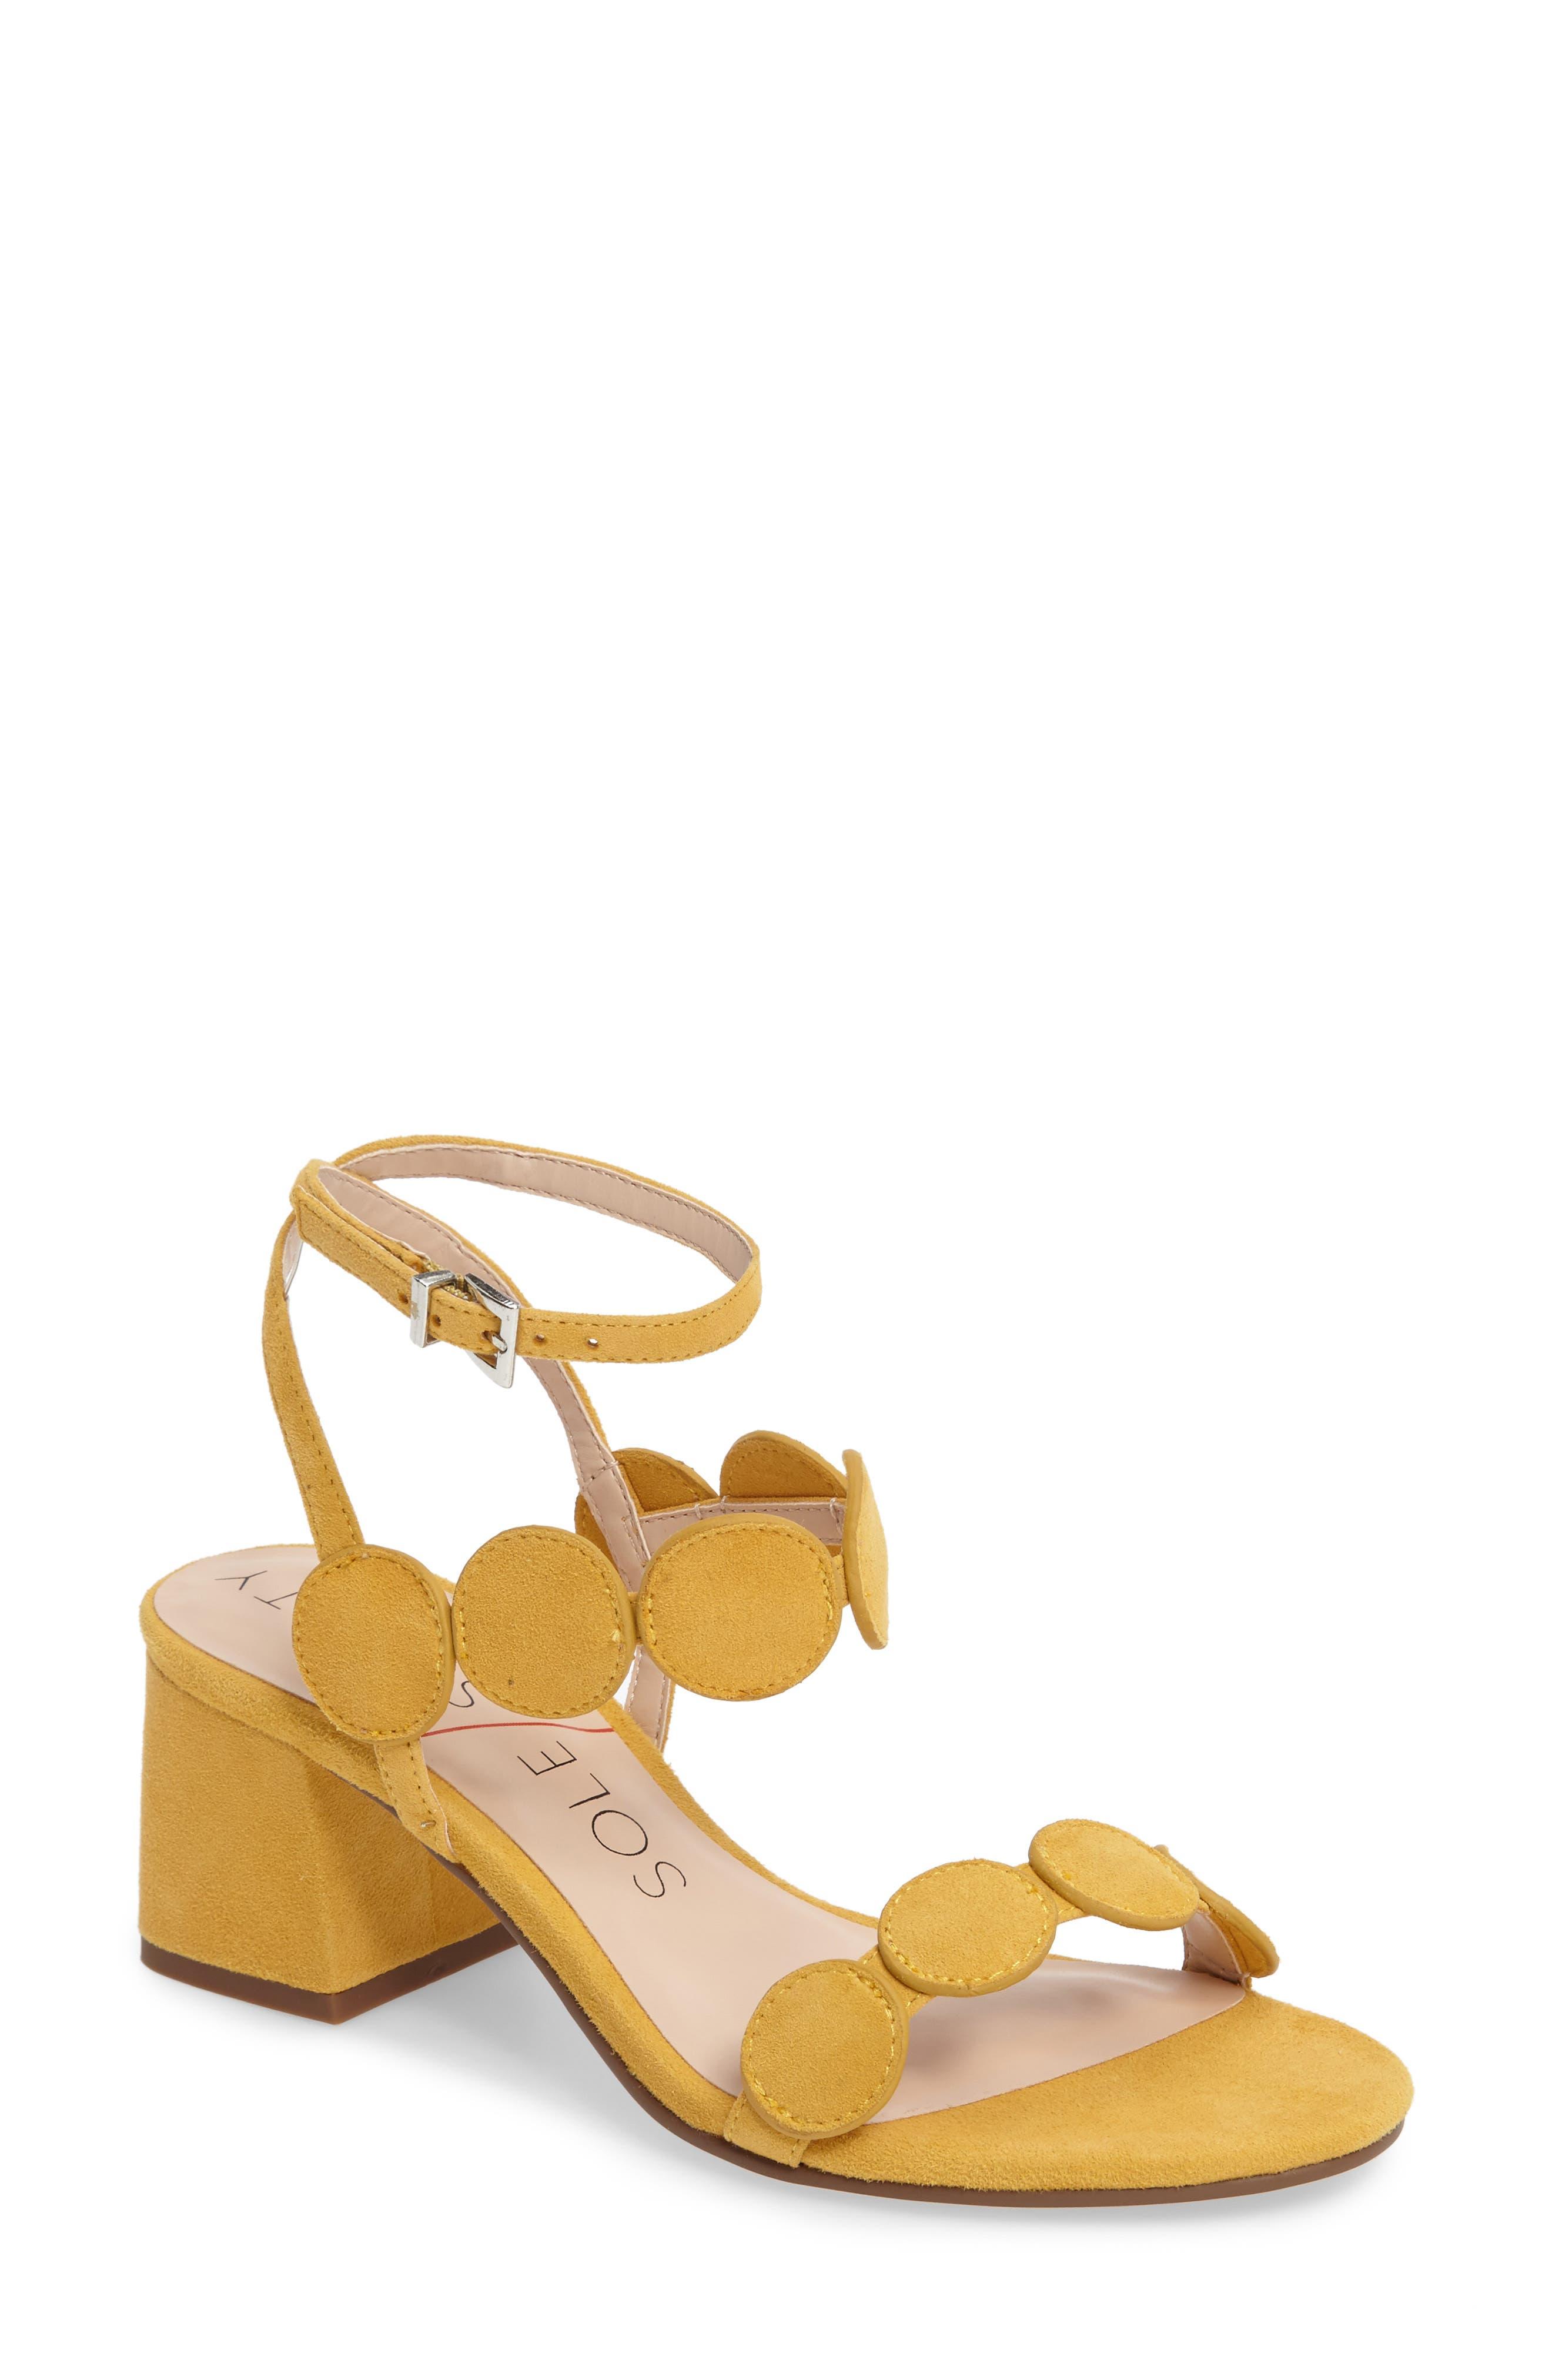 Shea Block Heel Sandal,                             Main thumbnail 7, color,